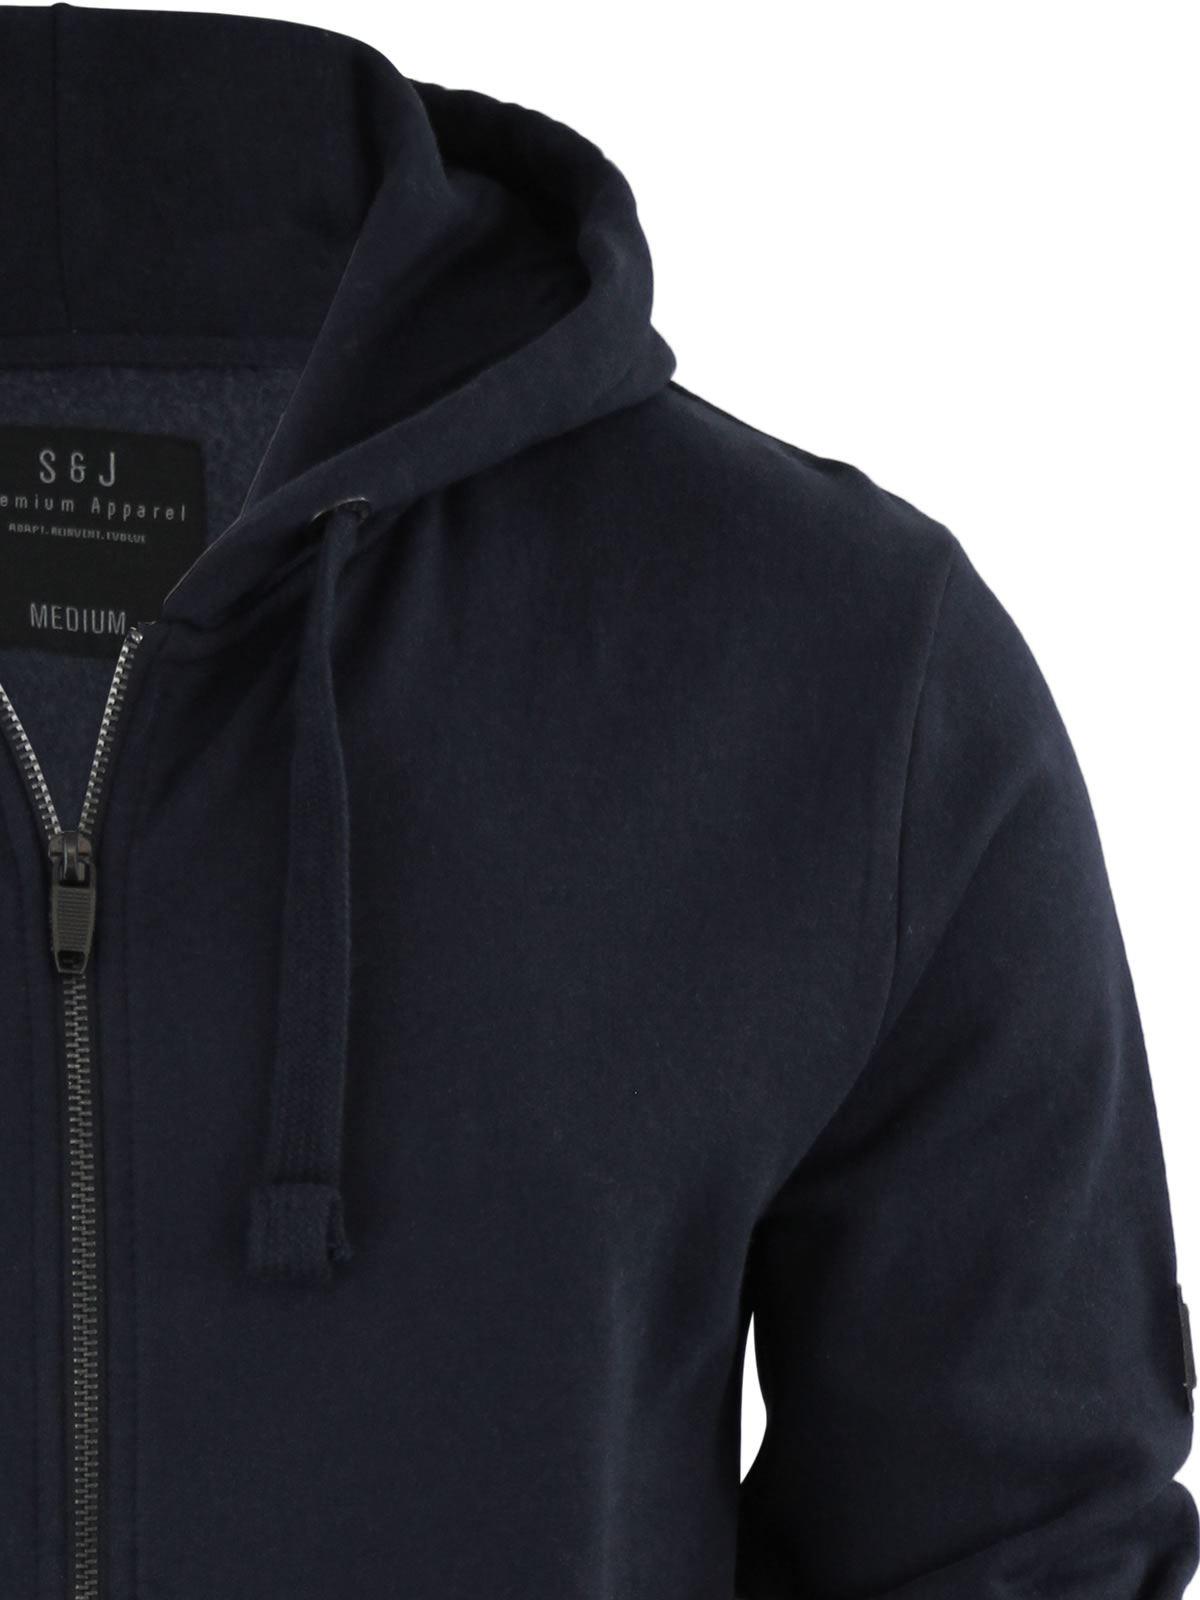 Mens-Hoodie-Smith-amp-Jones-Zip-Up-Hooded-Sweater-Jumper thumbnail 13